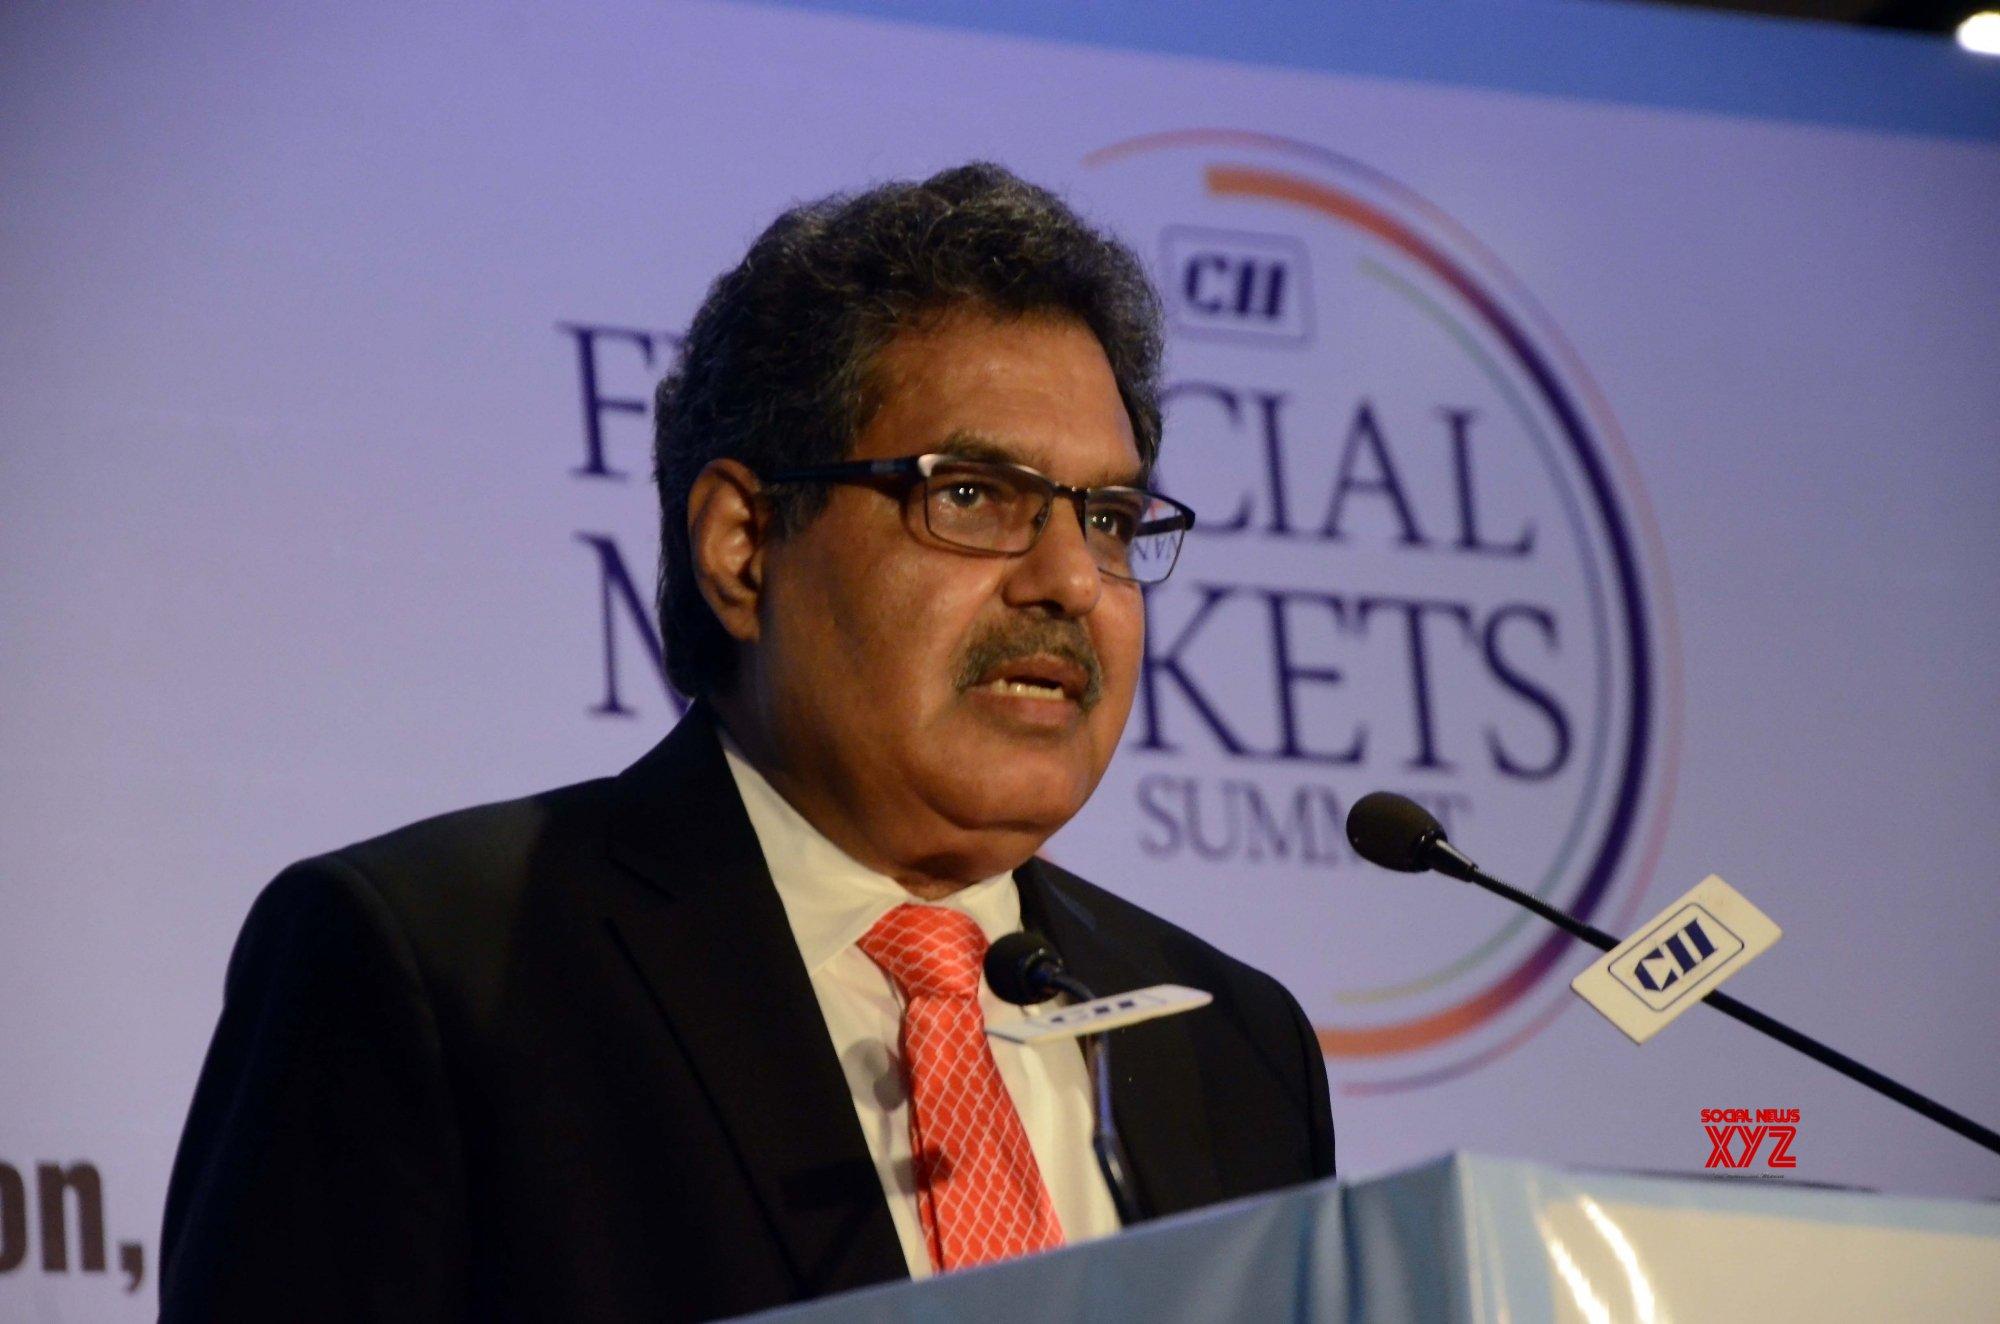 SEBI chief says IPOs like Zomato show maturity of Indian market